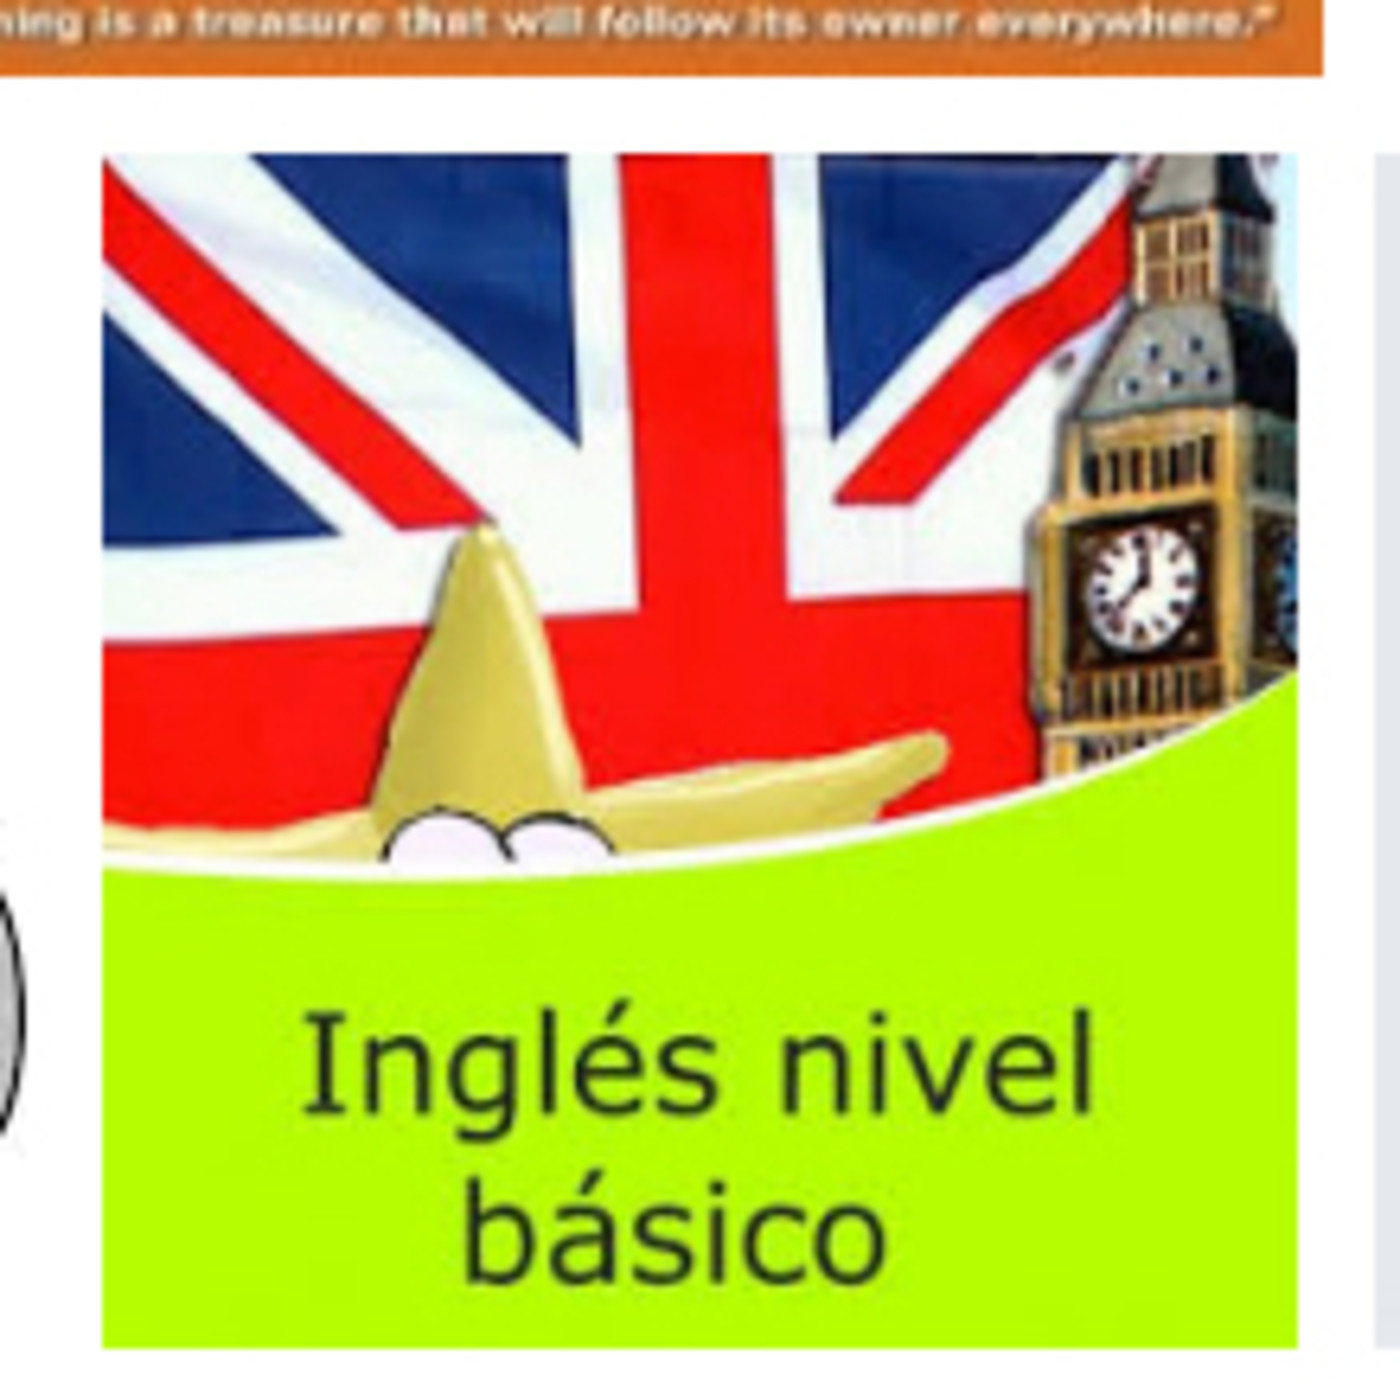 Inglés para principiantes 180 en Inglés Completo Principantes en mp3(19/10  a las 19:50:44) 49:05 21561834 - iVoox